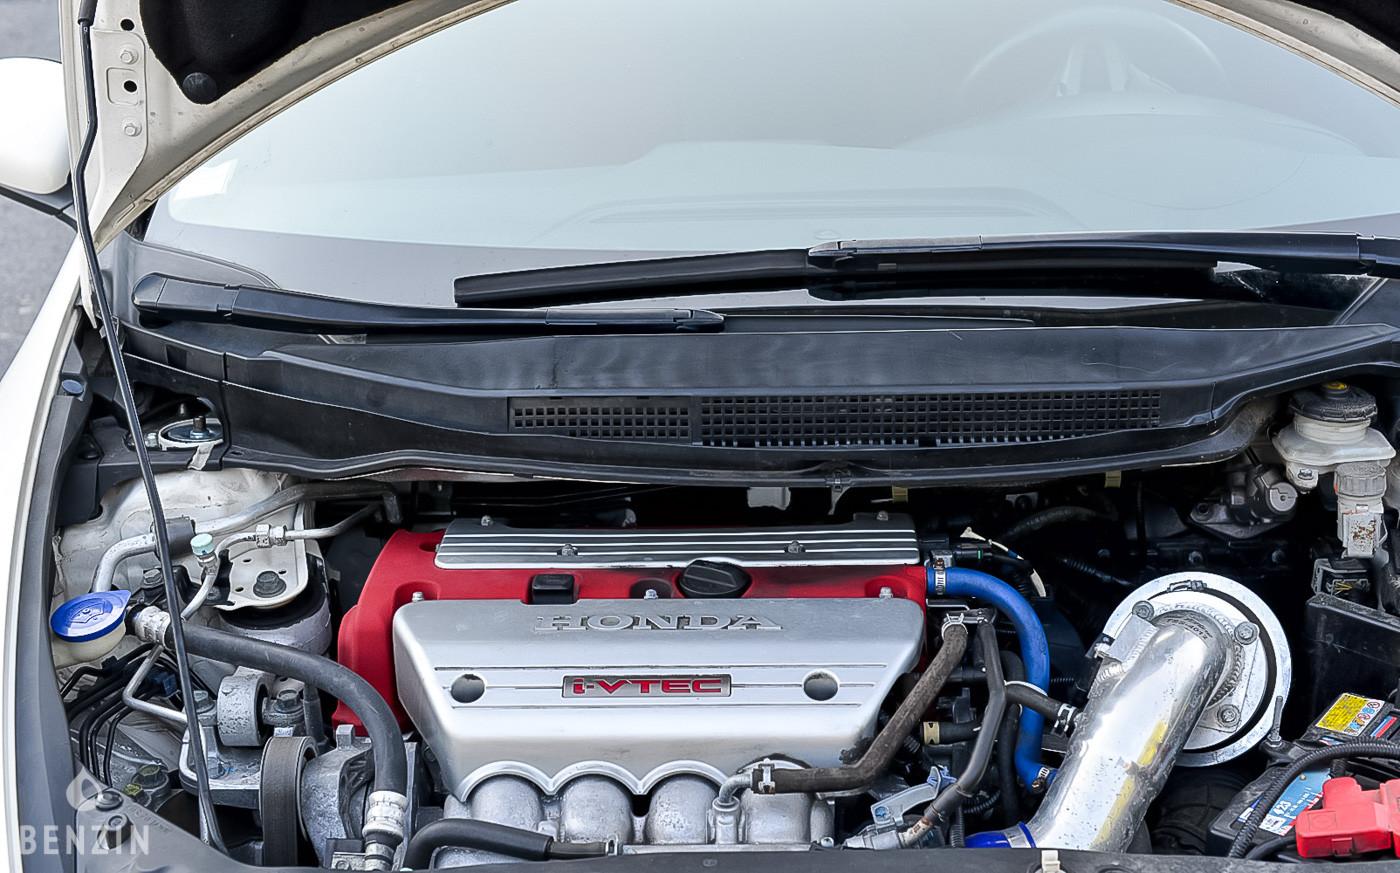 Honda Civic Type R White championship à vendre se vende for sale te koop zu verkaufen